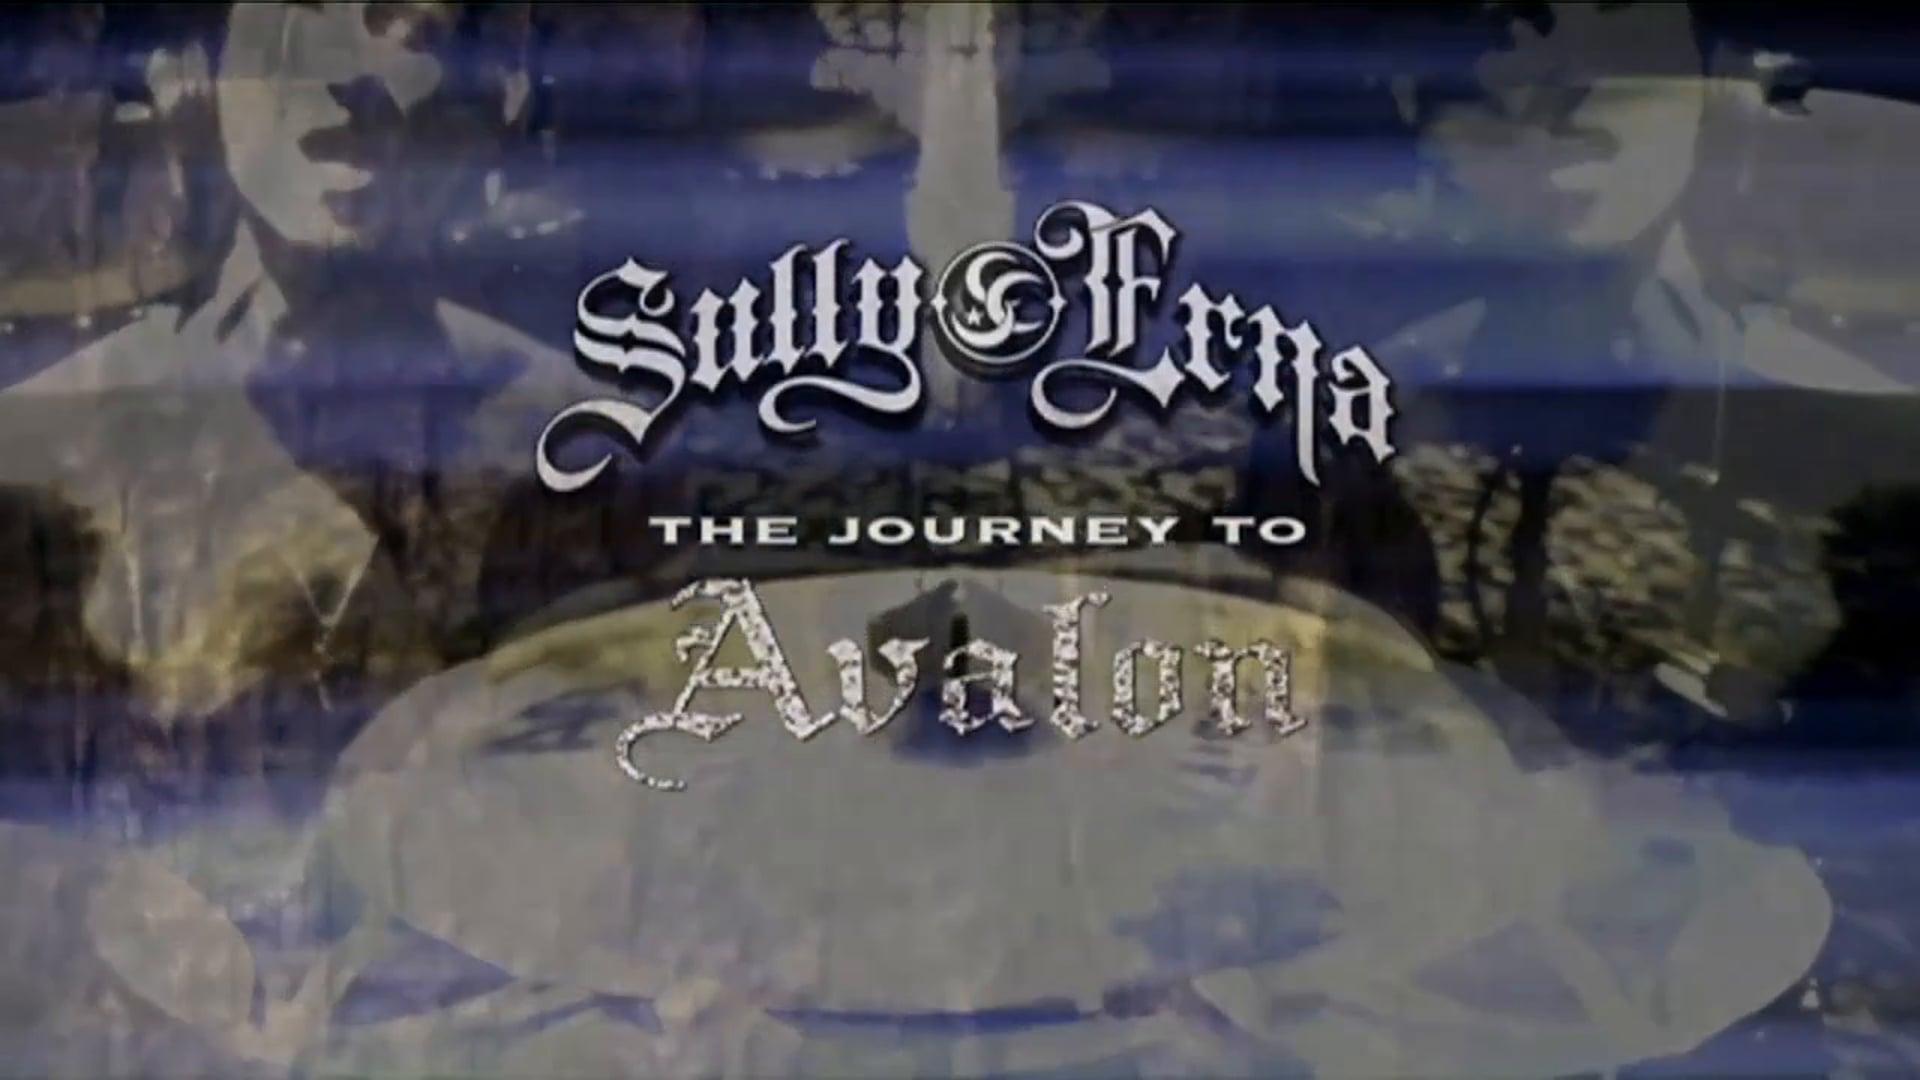 Sully Erna presents: JOURNEY TO AVALON